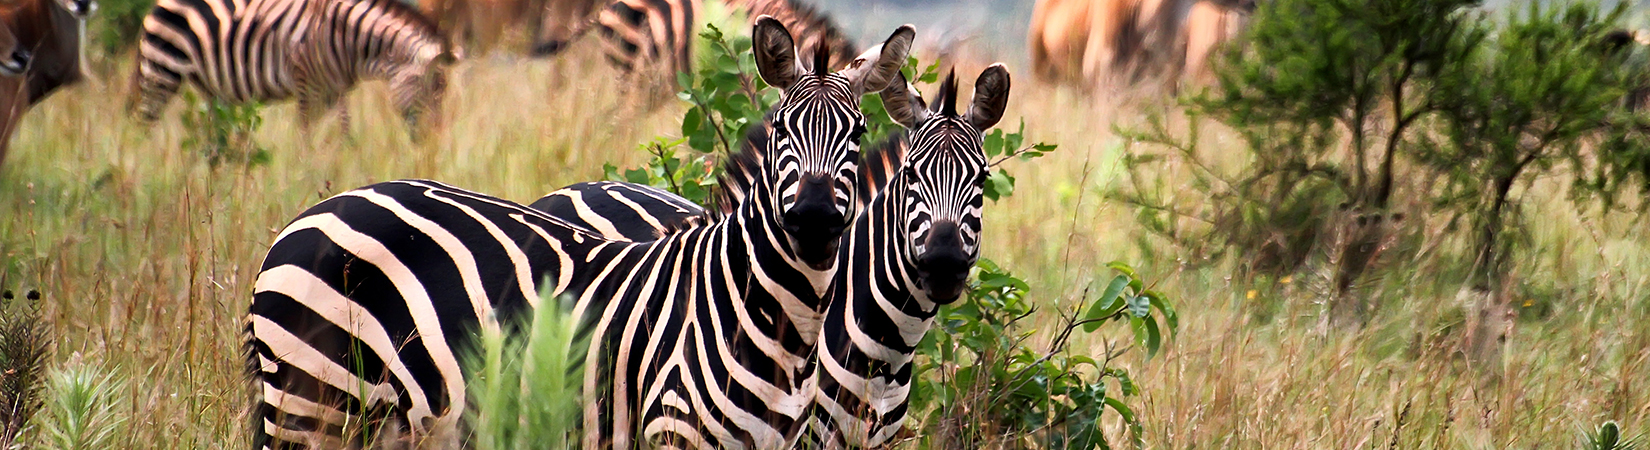 Incredible Rwanda a view of Akagera national park Rwanda